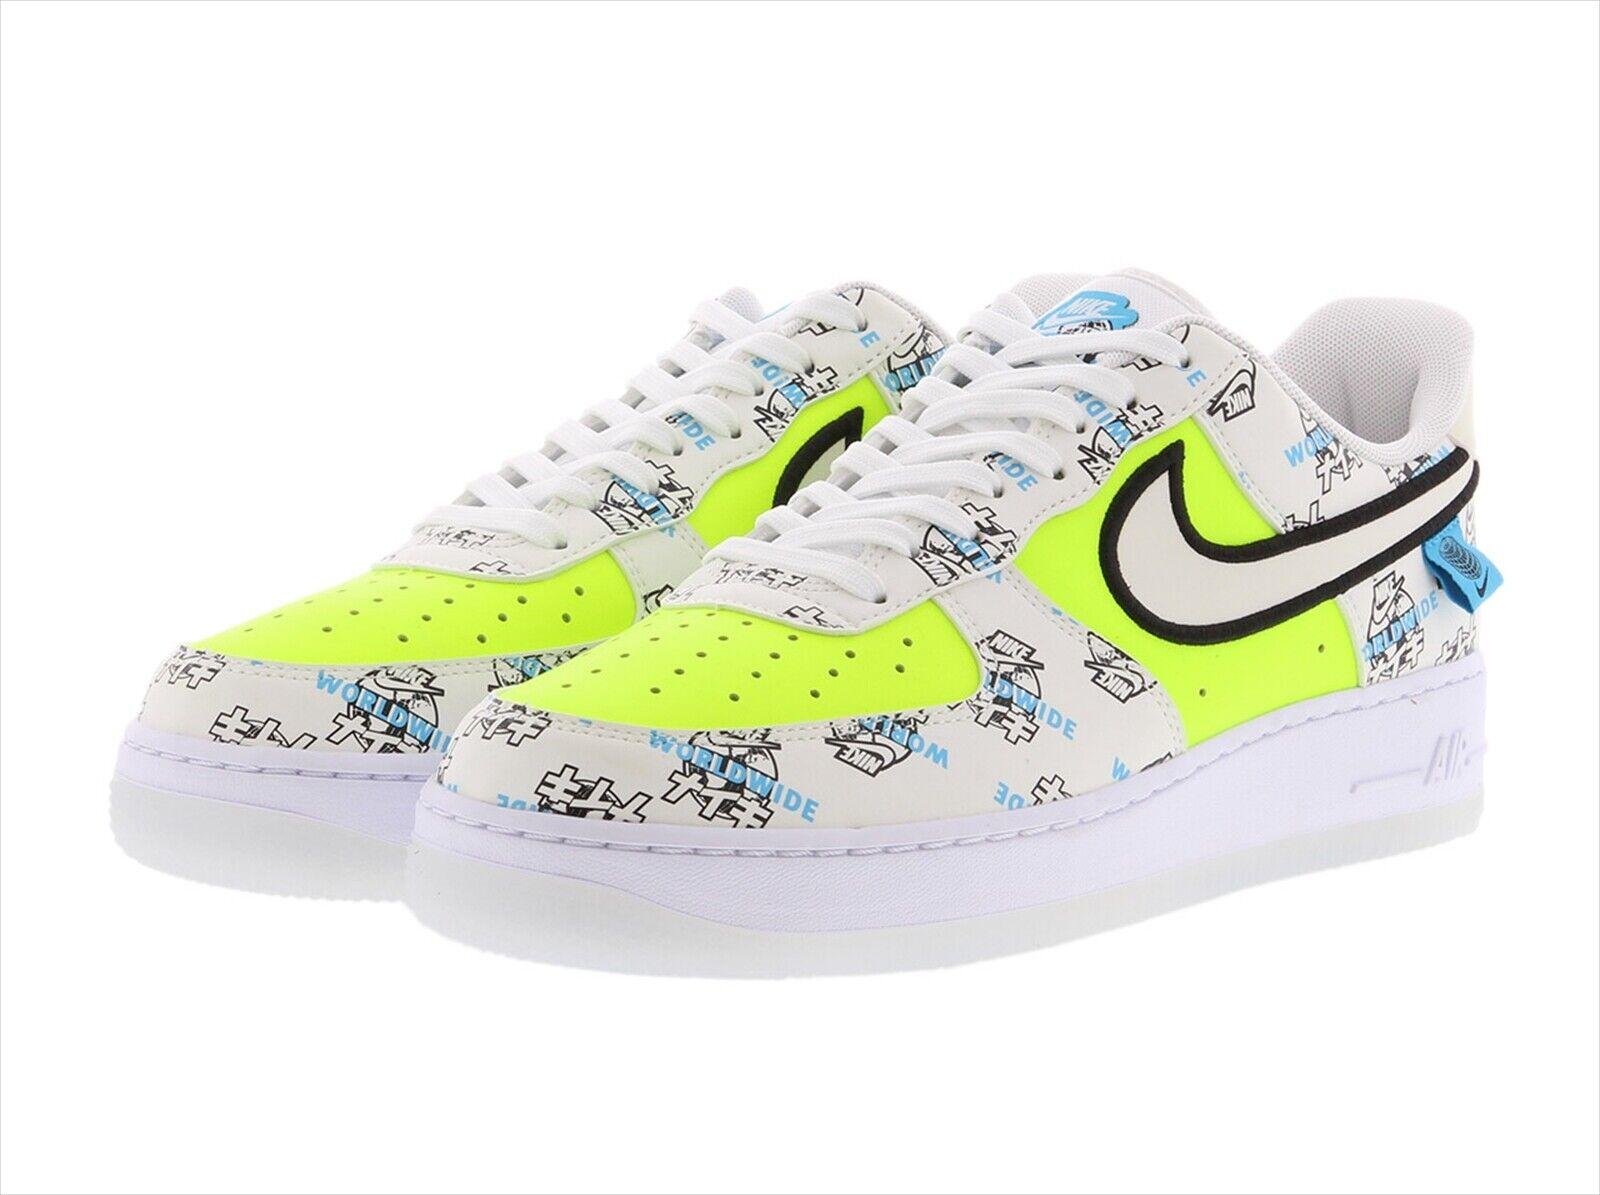 Size 8 - Nike Air Force 1 Low Worldwide Katakana White 2020 for ...